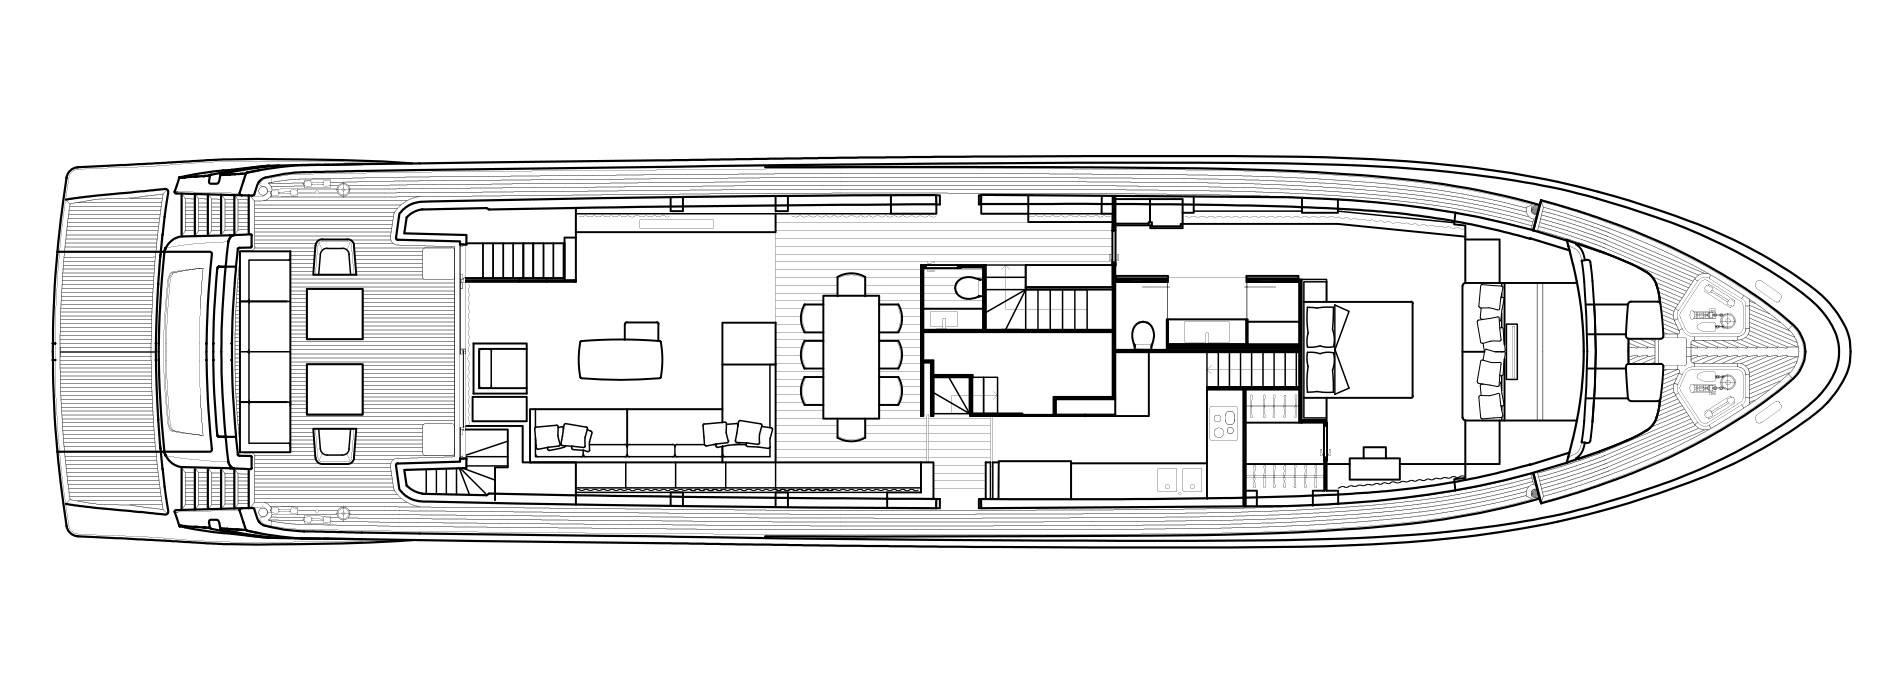 Sanlorenzo Yachts SL106 Cubierta principal